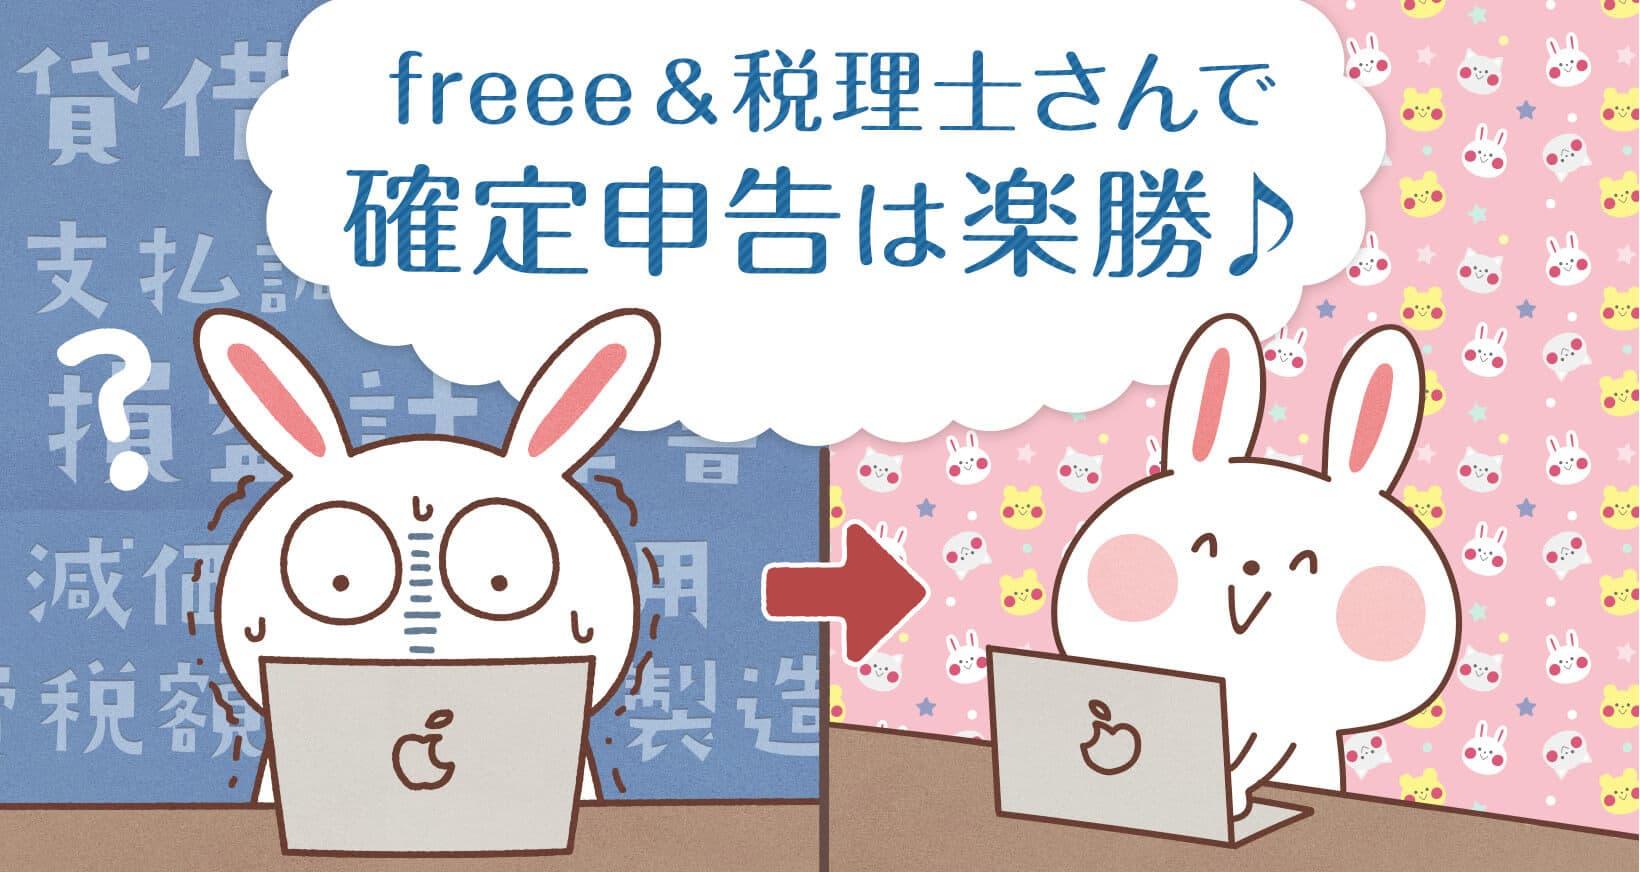 freee 確定申告 オンライン会計ソフト 簡単 認定アドバイザー 税理士 使い方